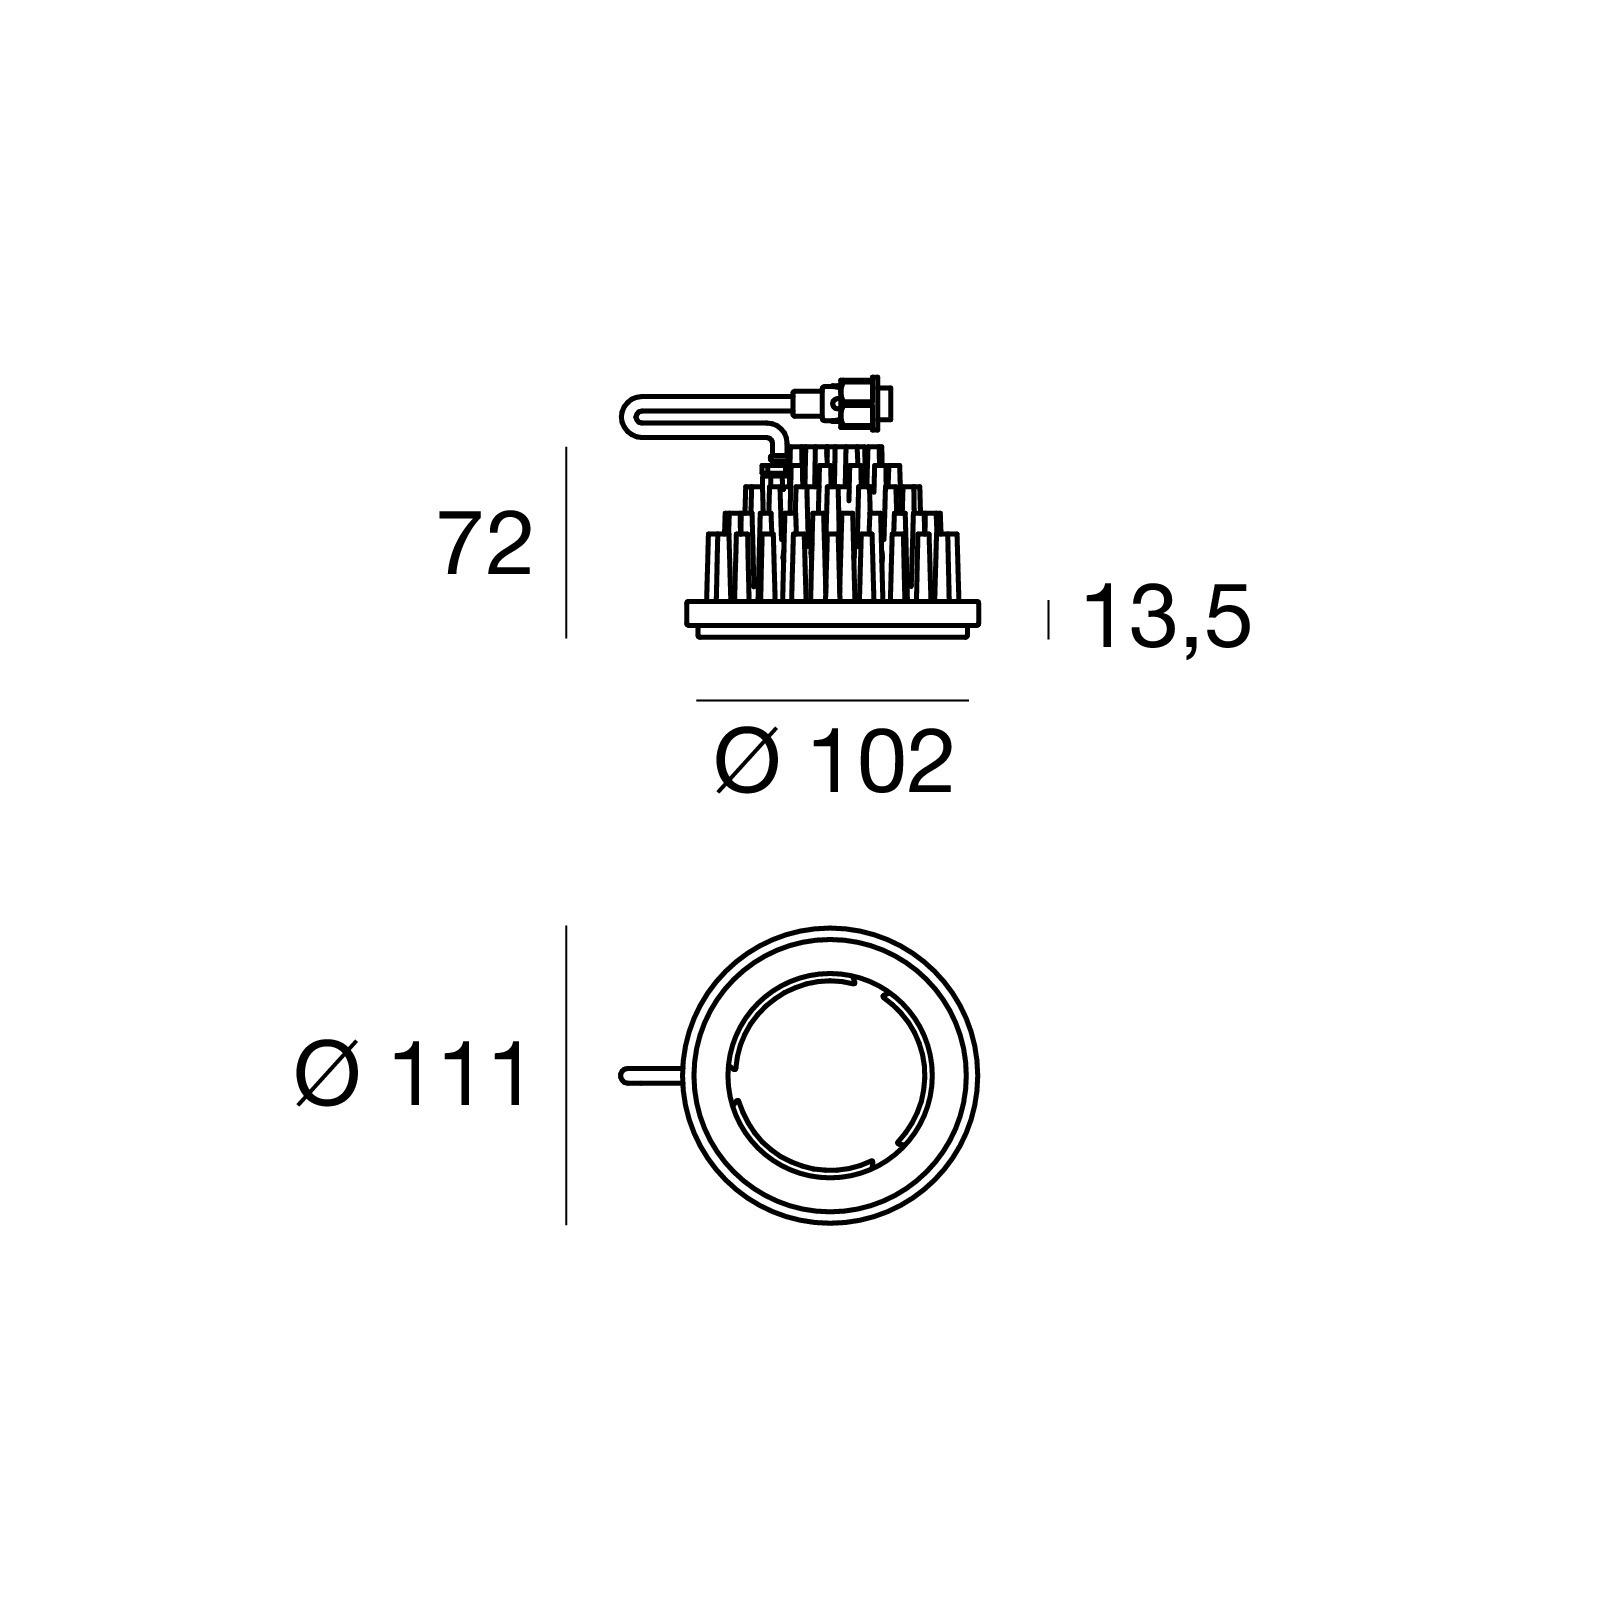 Illuminator 97483N30 - black - arrayLED - 15 W - Linea Light Group